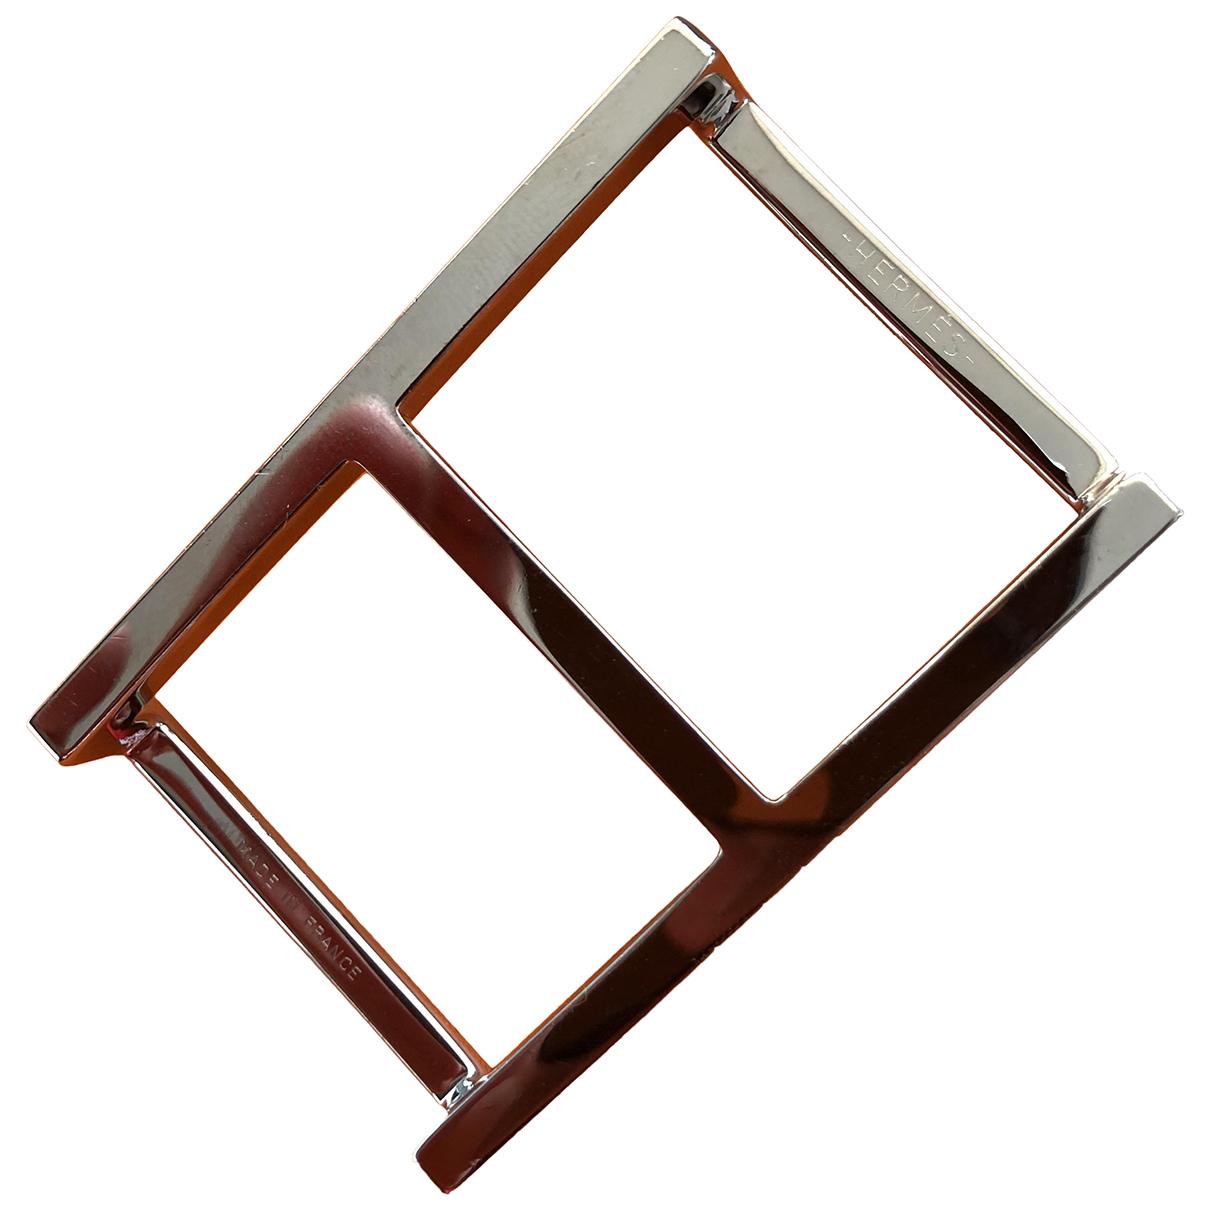 Hermès Boucle seule / Belt buckle Silver Metal belt for Men 85 cm